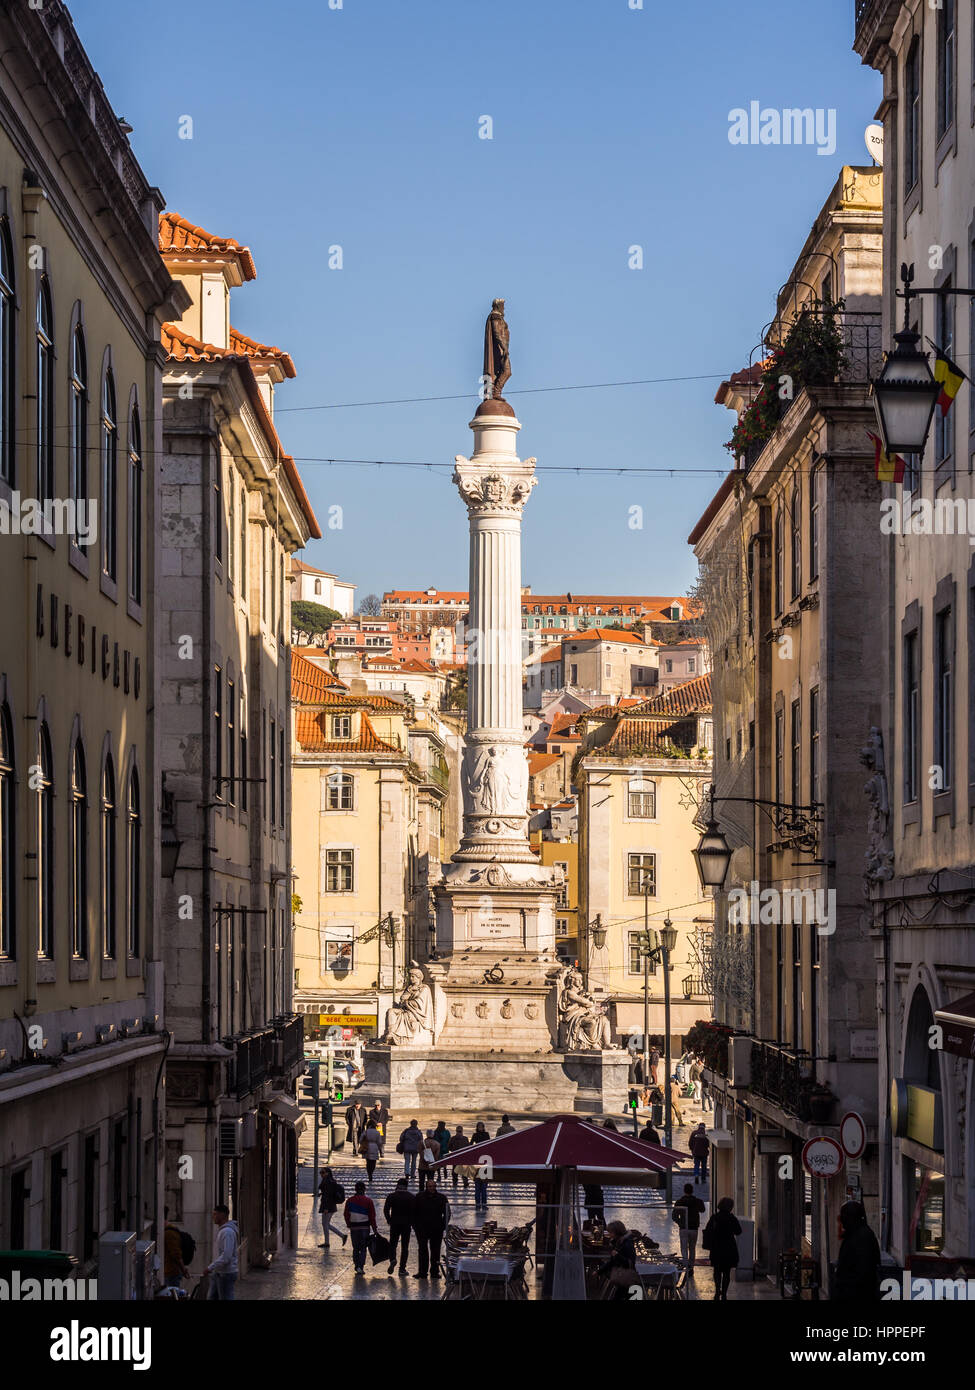 VertLISBON, Portugal - 10 de enero de 2017: Columna de Pedro IV en el Rossio Square (Plaza de Pedro IV), celebrada Imagen De Stock